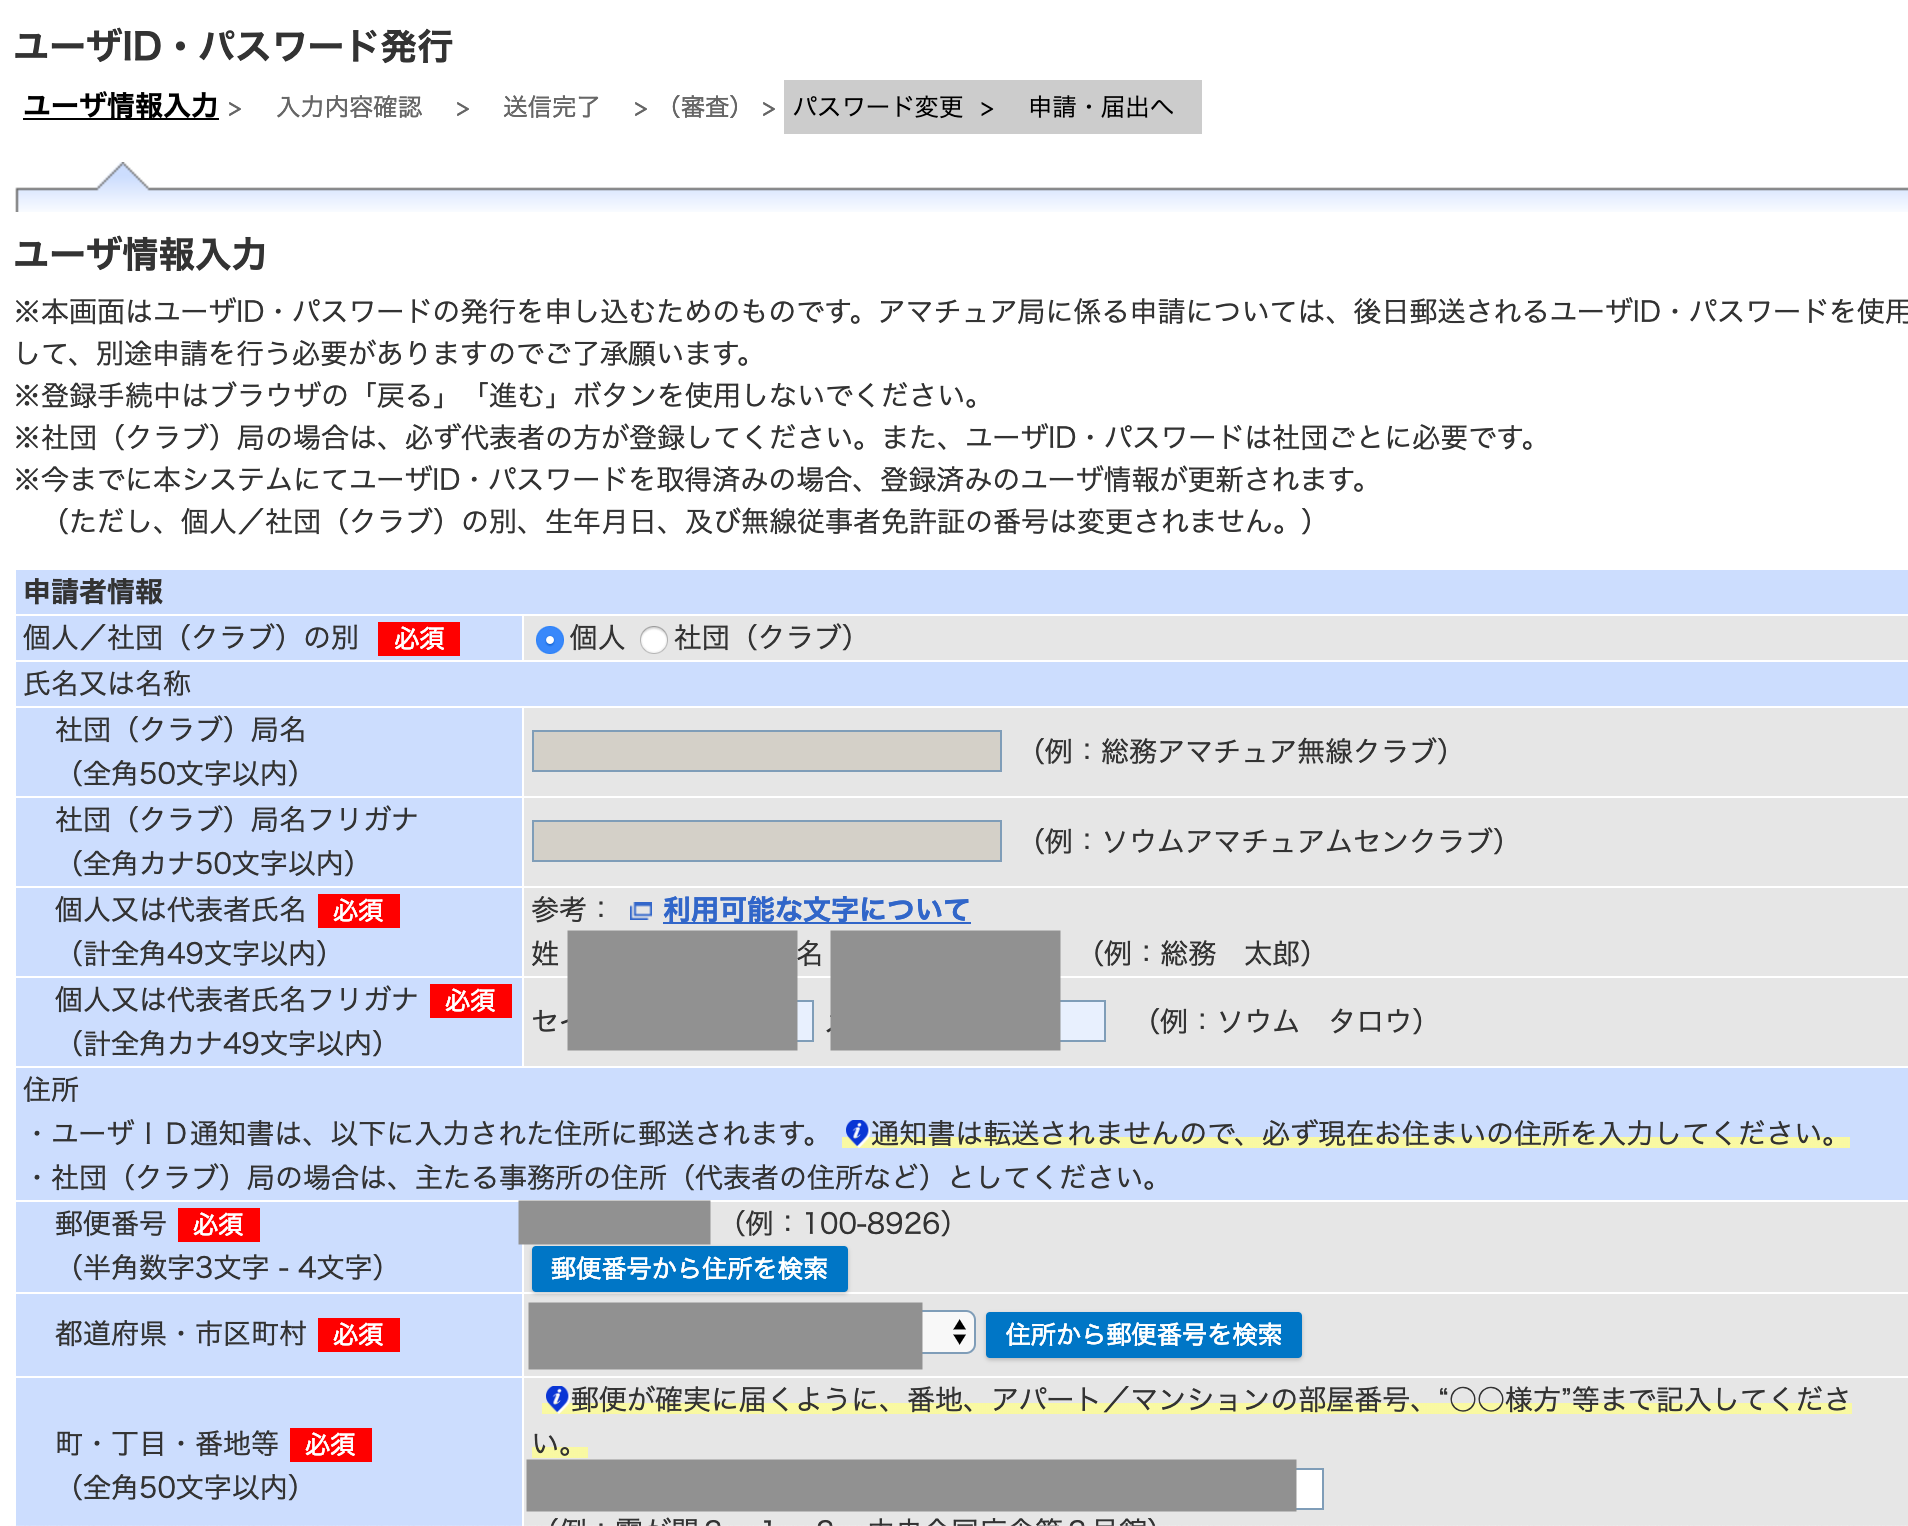 radio_station_signup_01.png